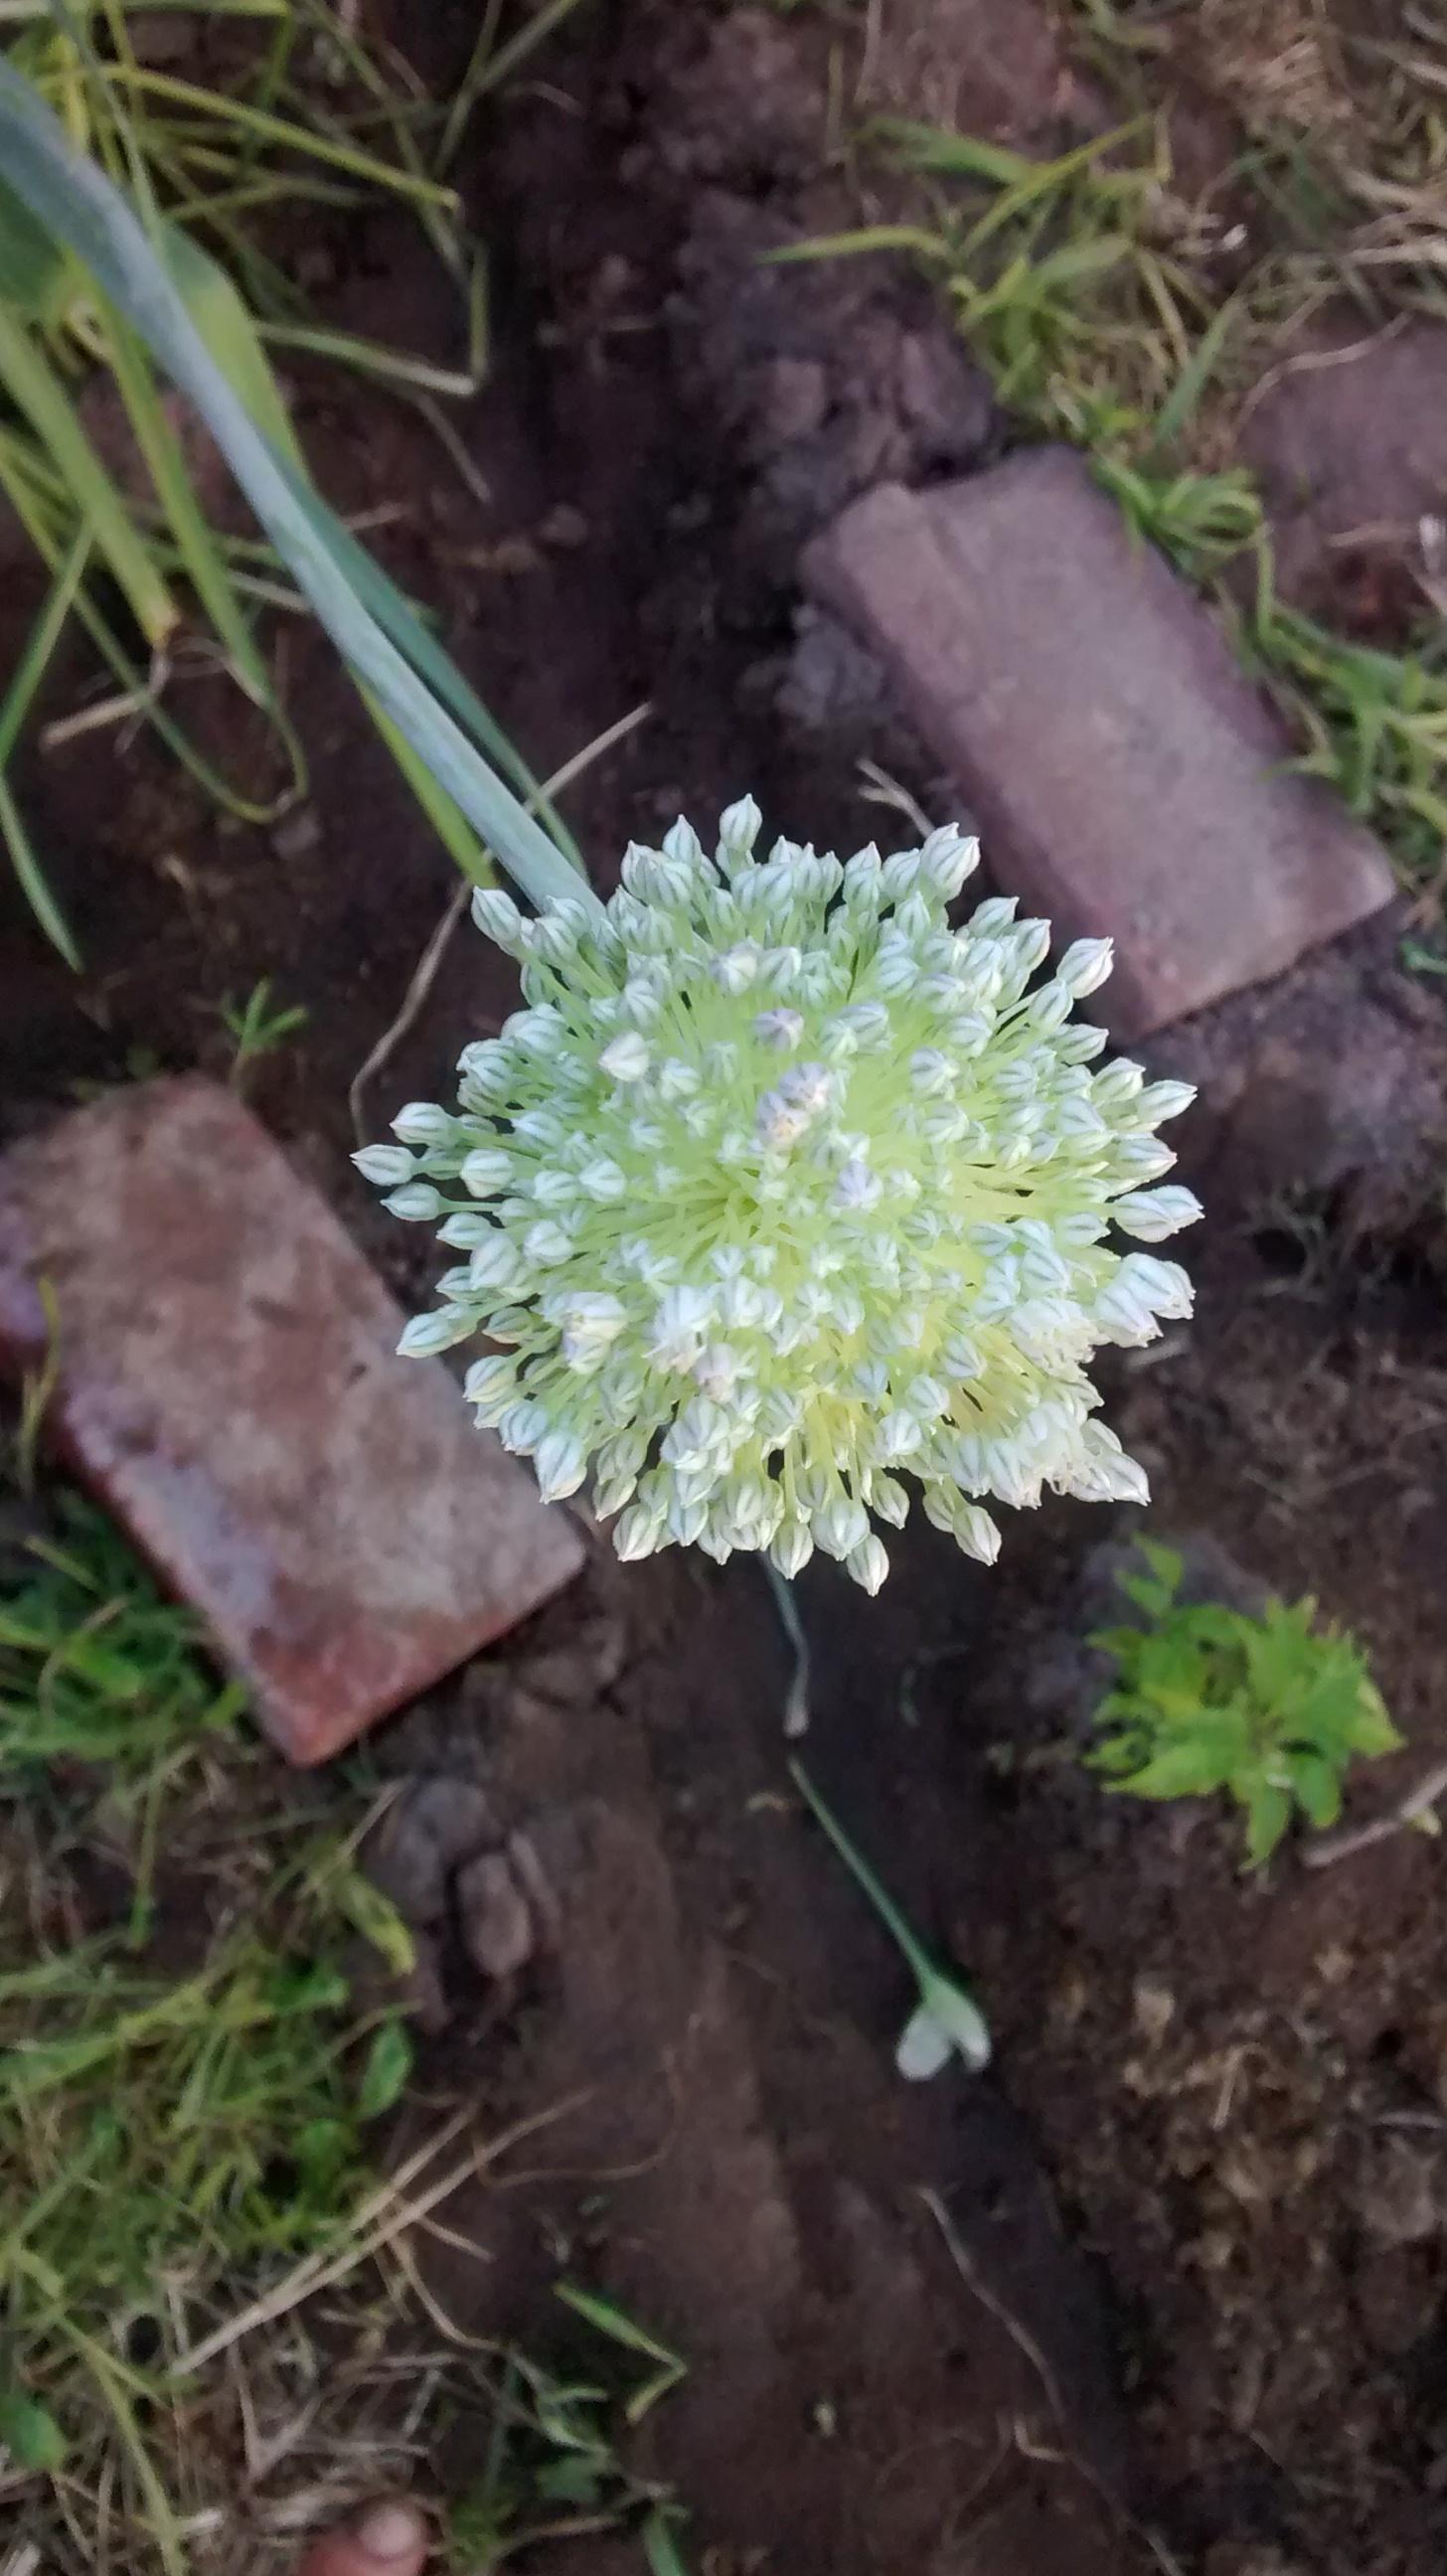 ba-231-1-flower-onion-white